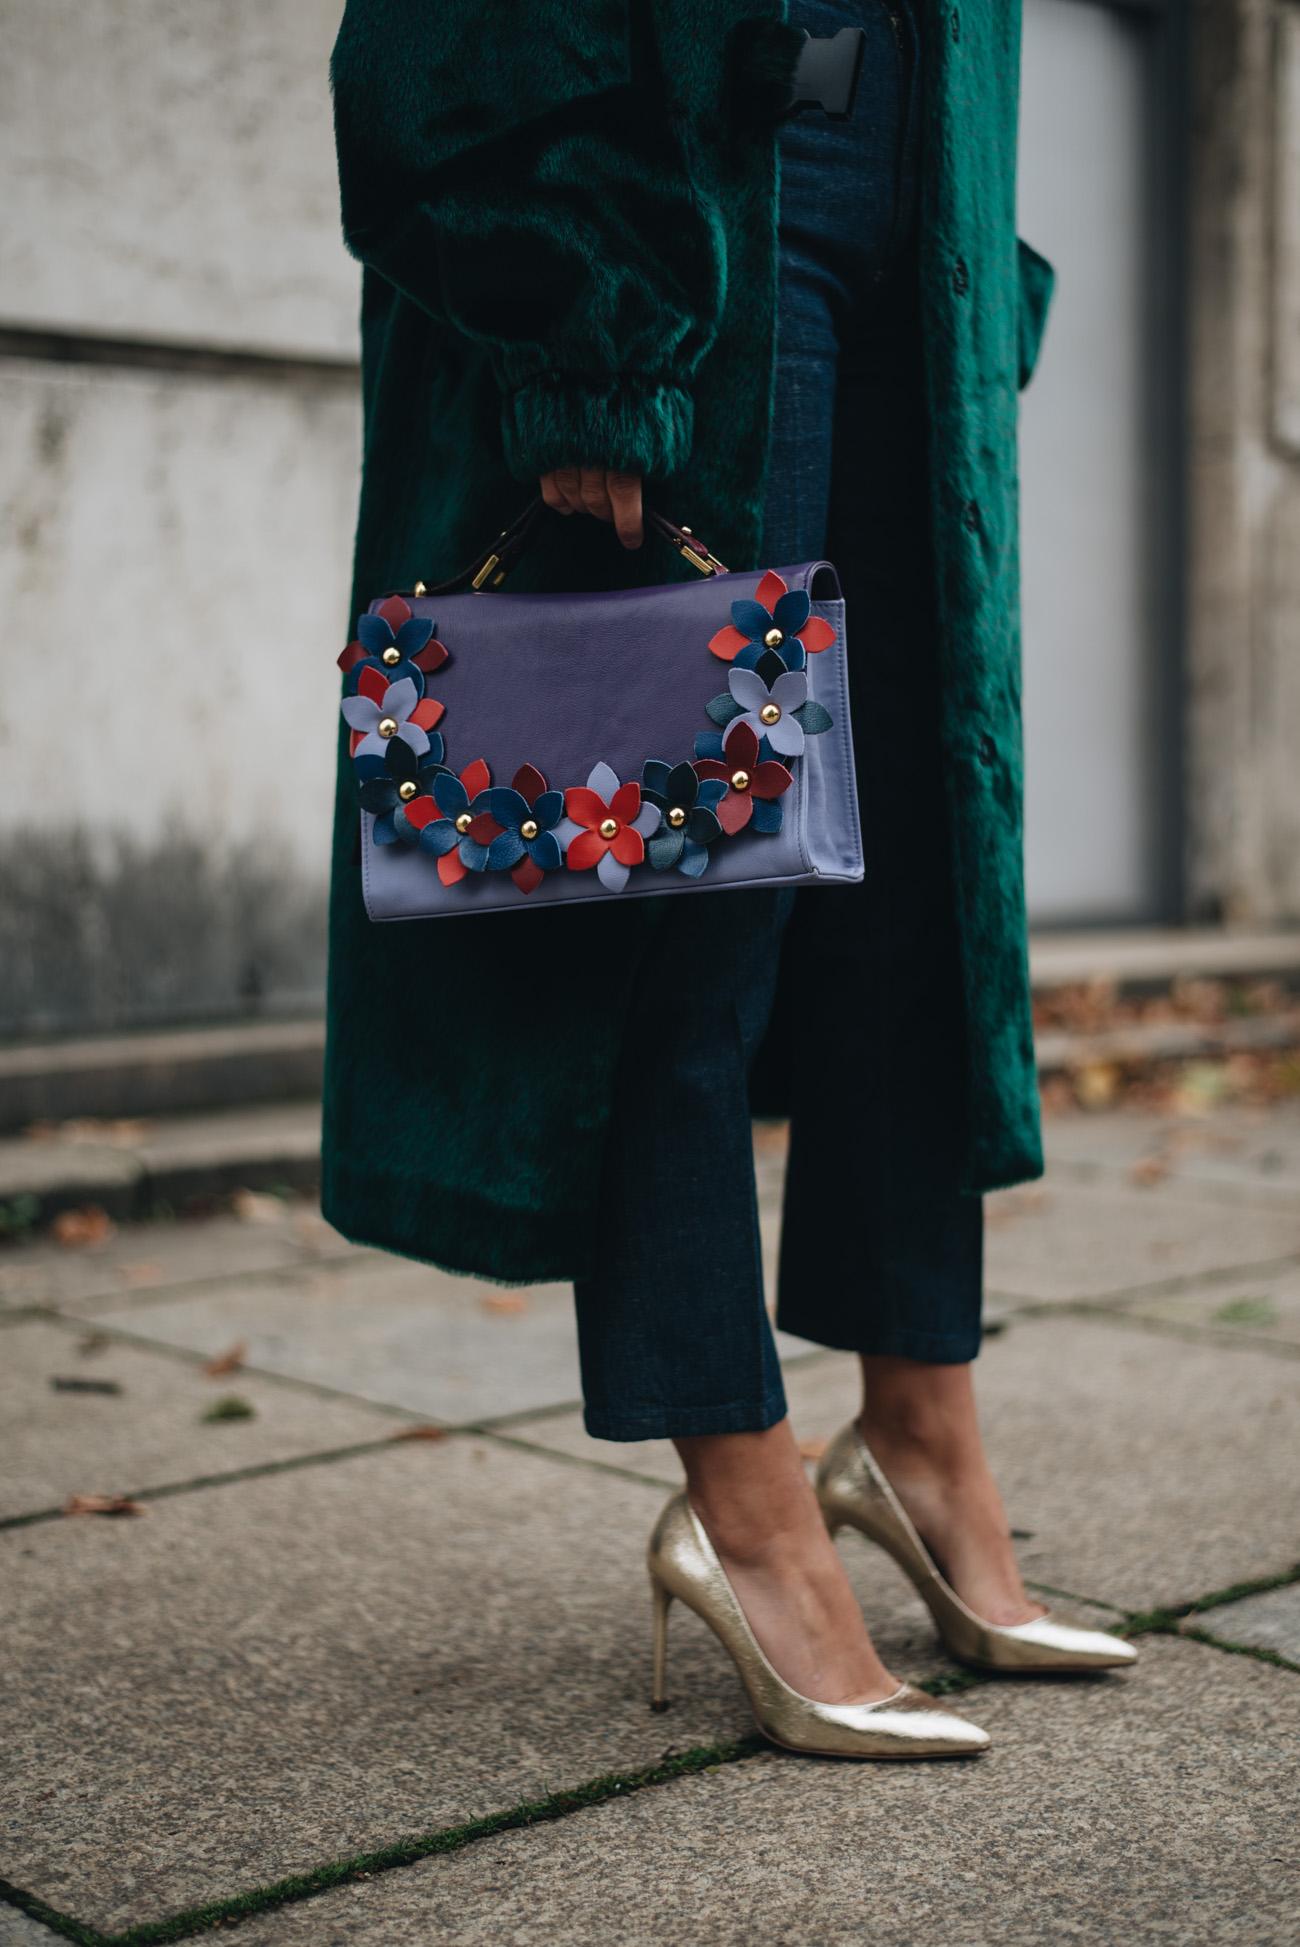 Oversize-Fell-Mantel-fake-fur-coat-minty-square-Nina-Schwichtenberg-mode-bloggerin-fashion-lifestyle-deutschland-münchen-fashiioncarpet